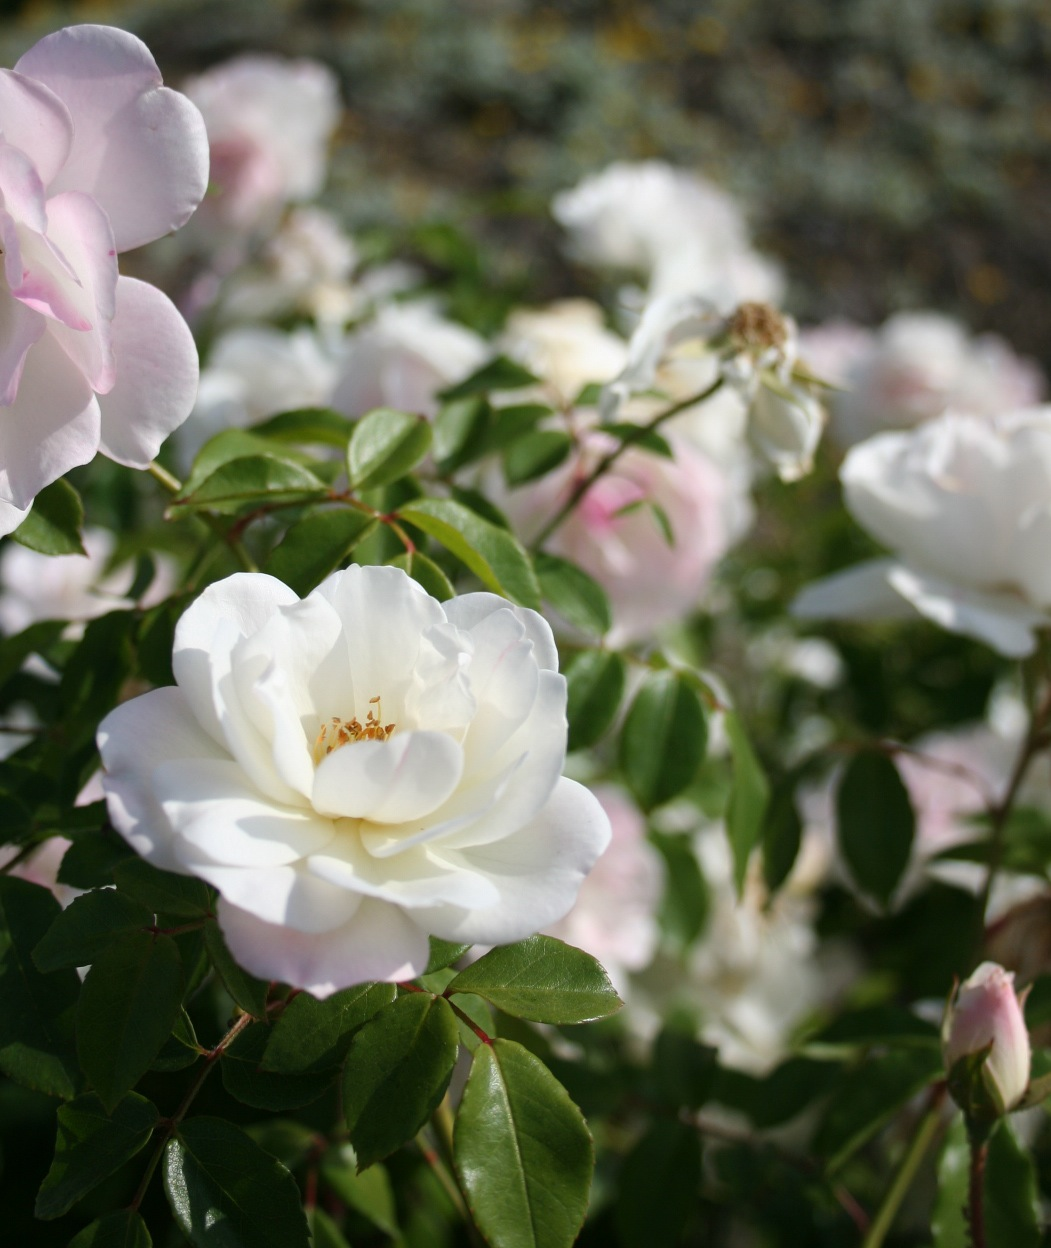 White Flower by HaMaSeR